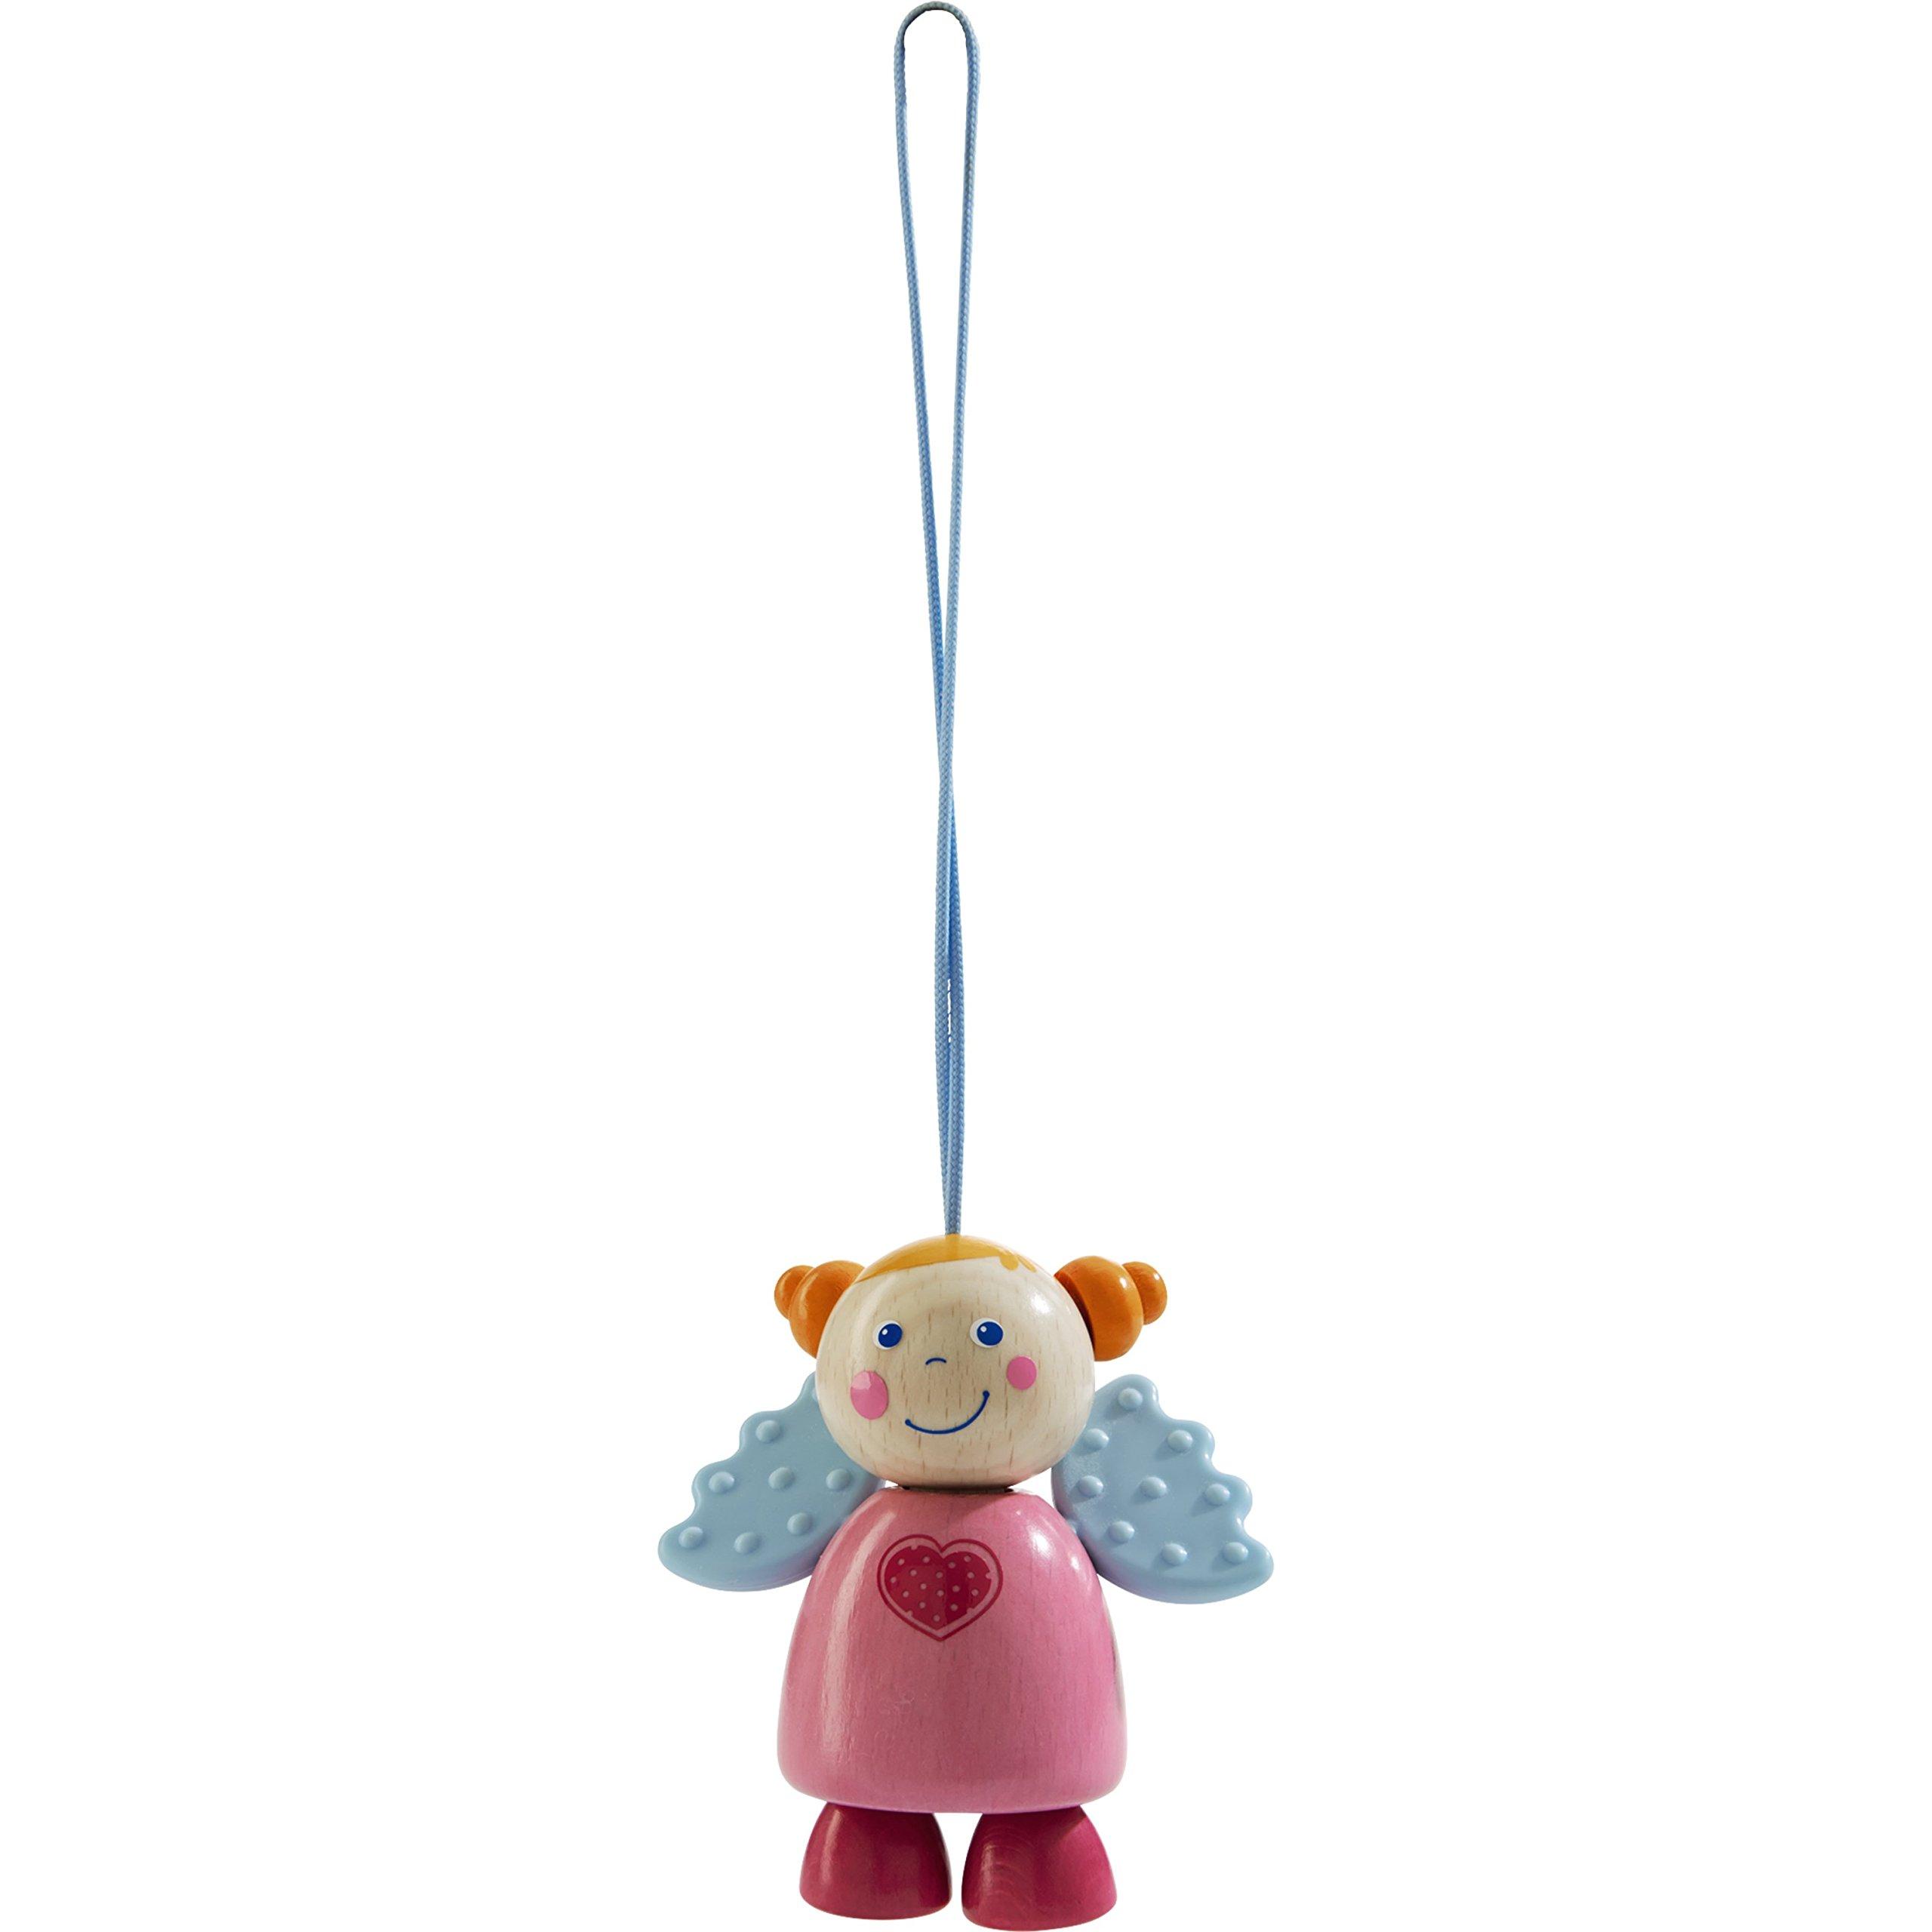 HABA Dangling Figure Guardian Angel Sara by HABA (Image #1)